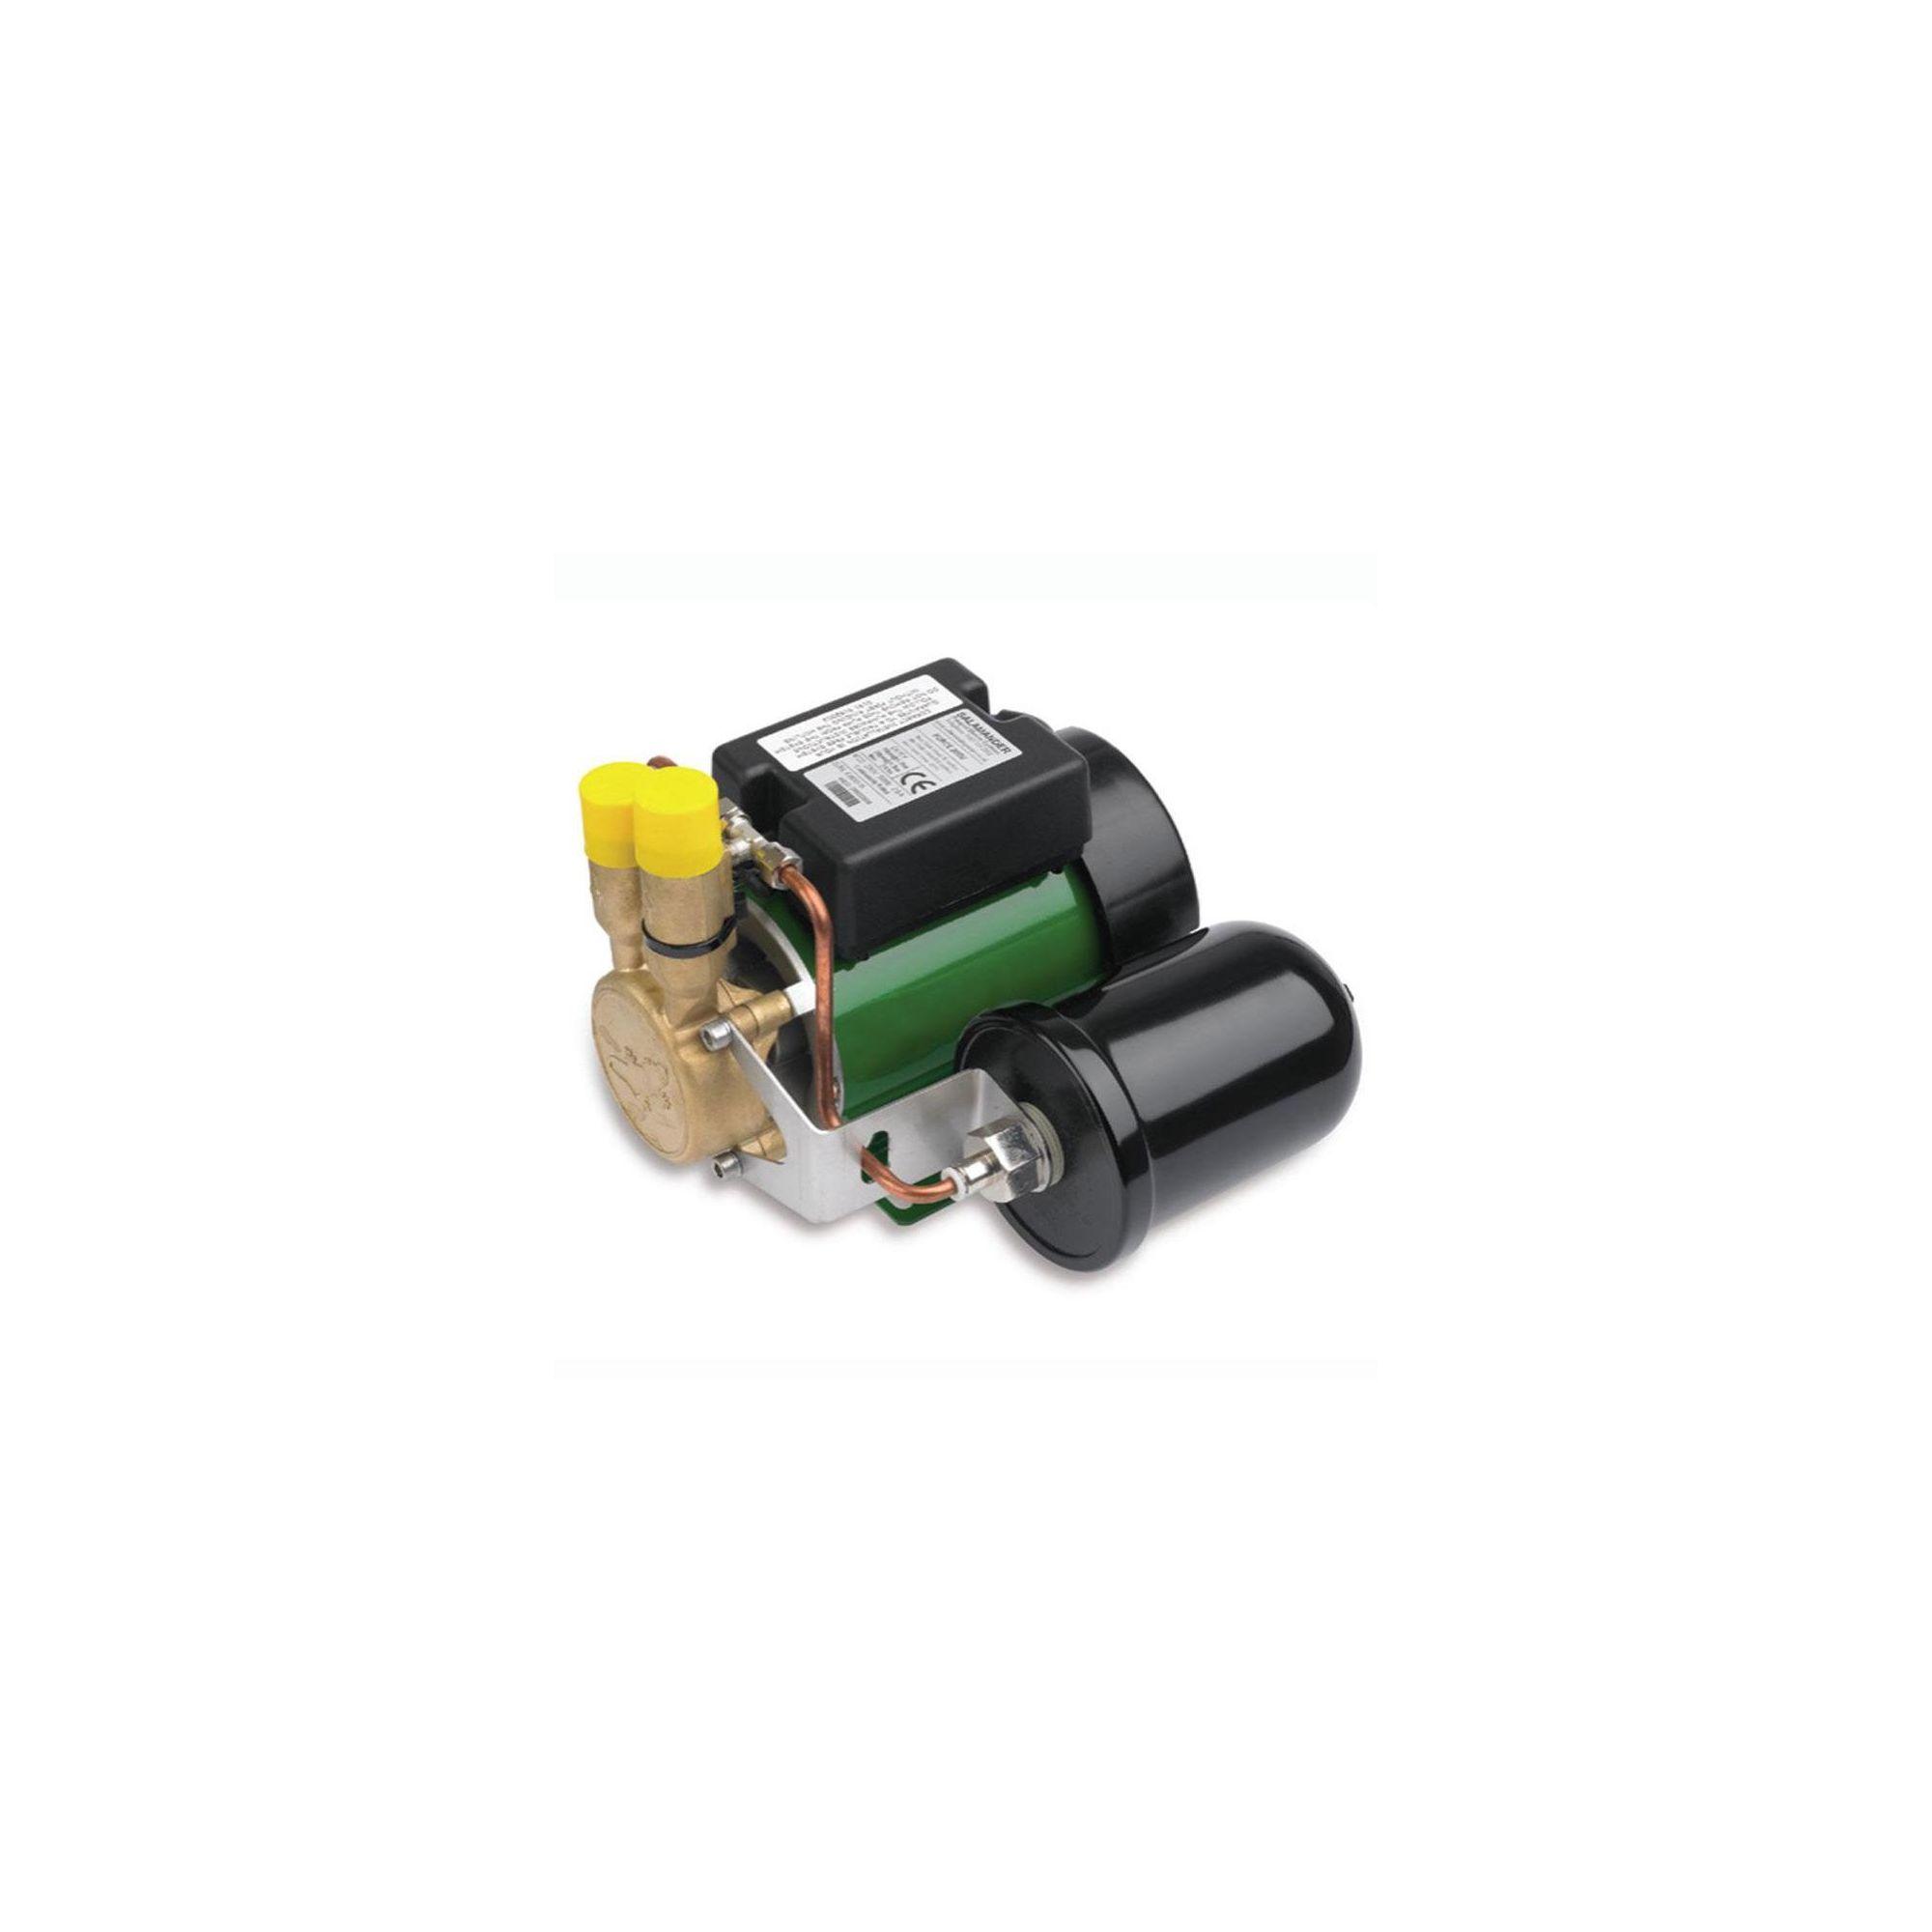 Salamander Force 20 SU Universal Single Impeller Shower Pump, Positive or Negative Head, 2.0 Bar at Tesco Direct